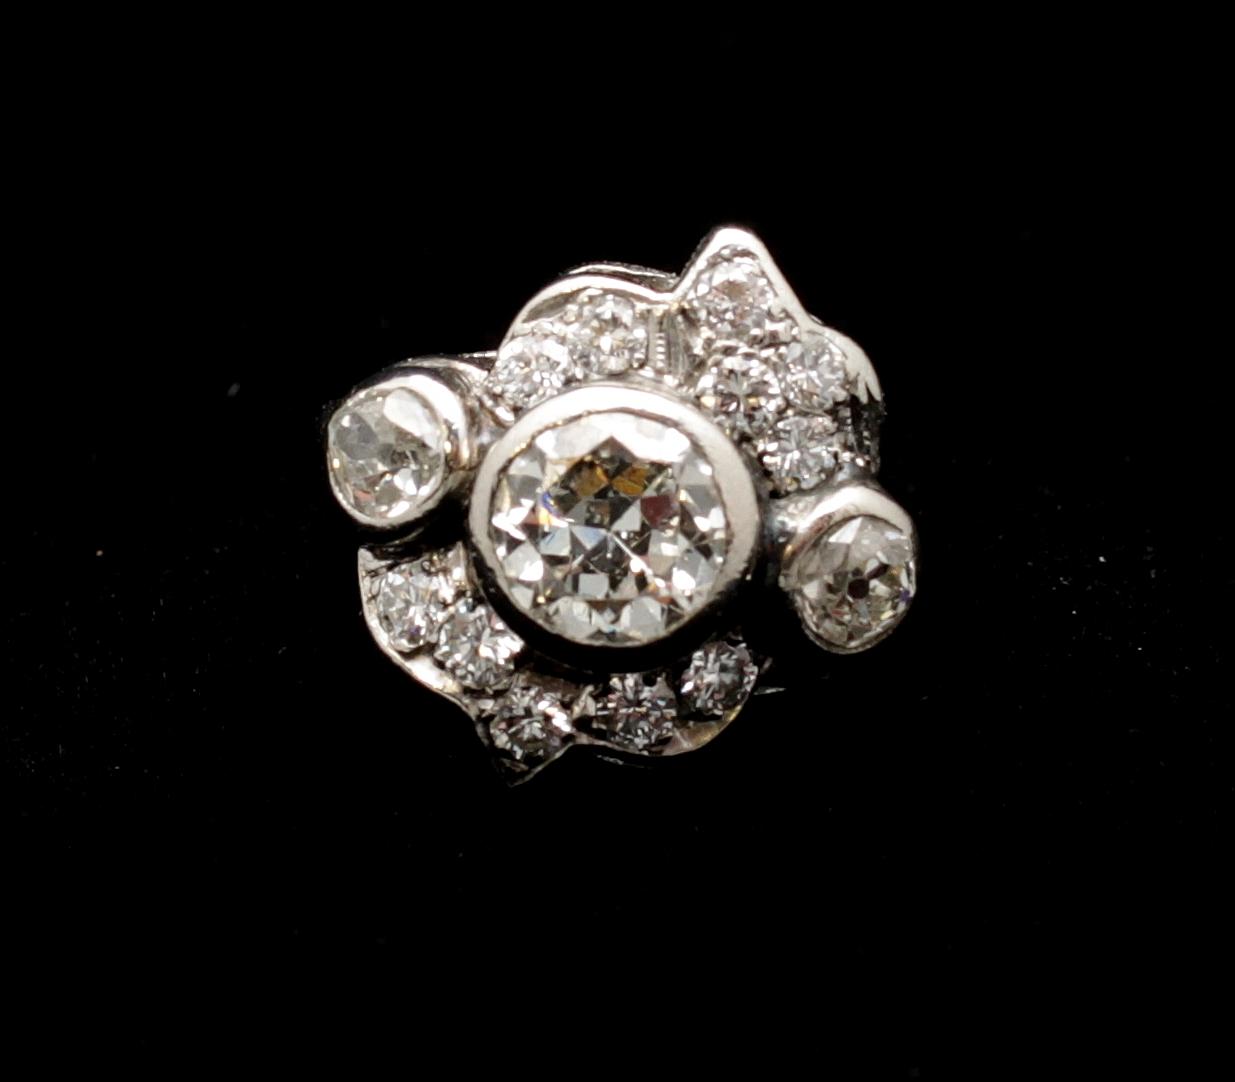 Antique Platinum Diamond Old Mine Cut 5.15cts Ring